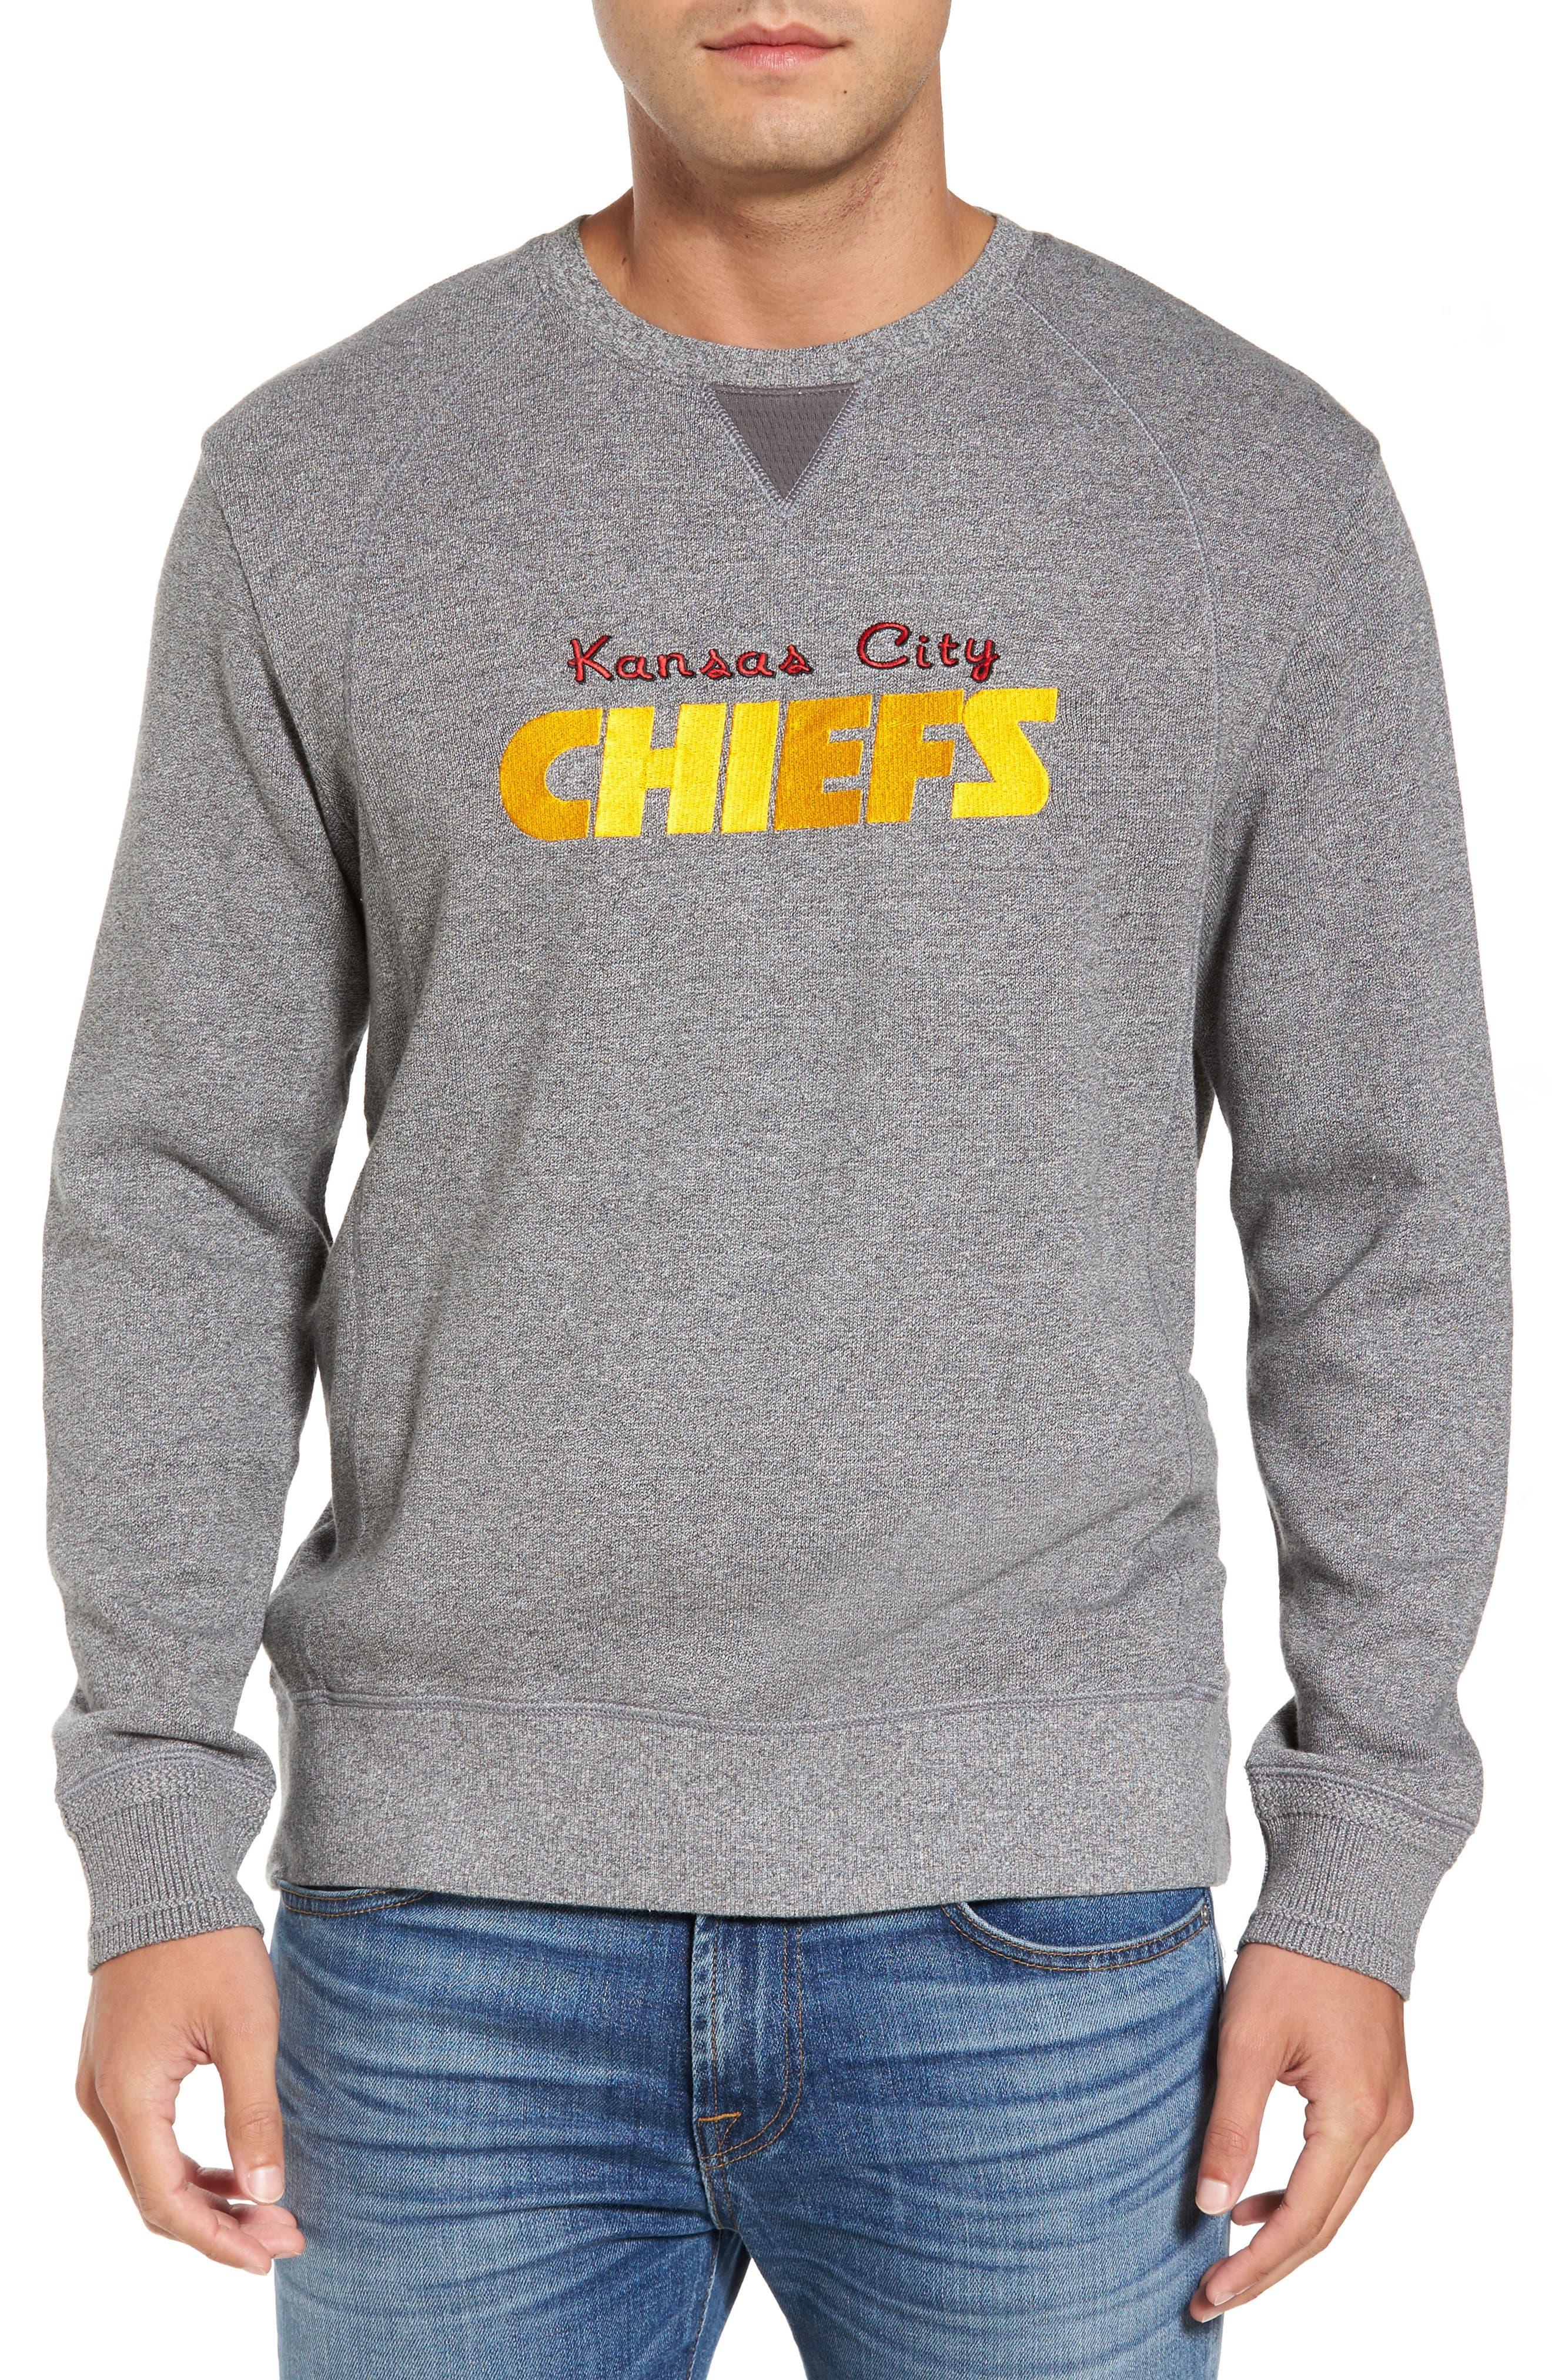 NFL Stitch of Liberty Embroidered Crewneck Sweatshirt,                             Main thumbnail 10, color,